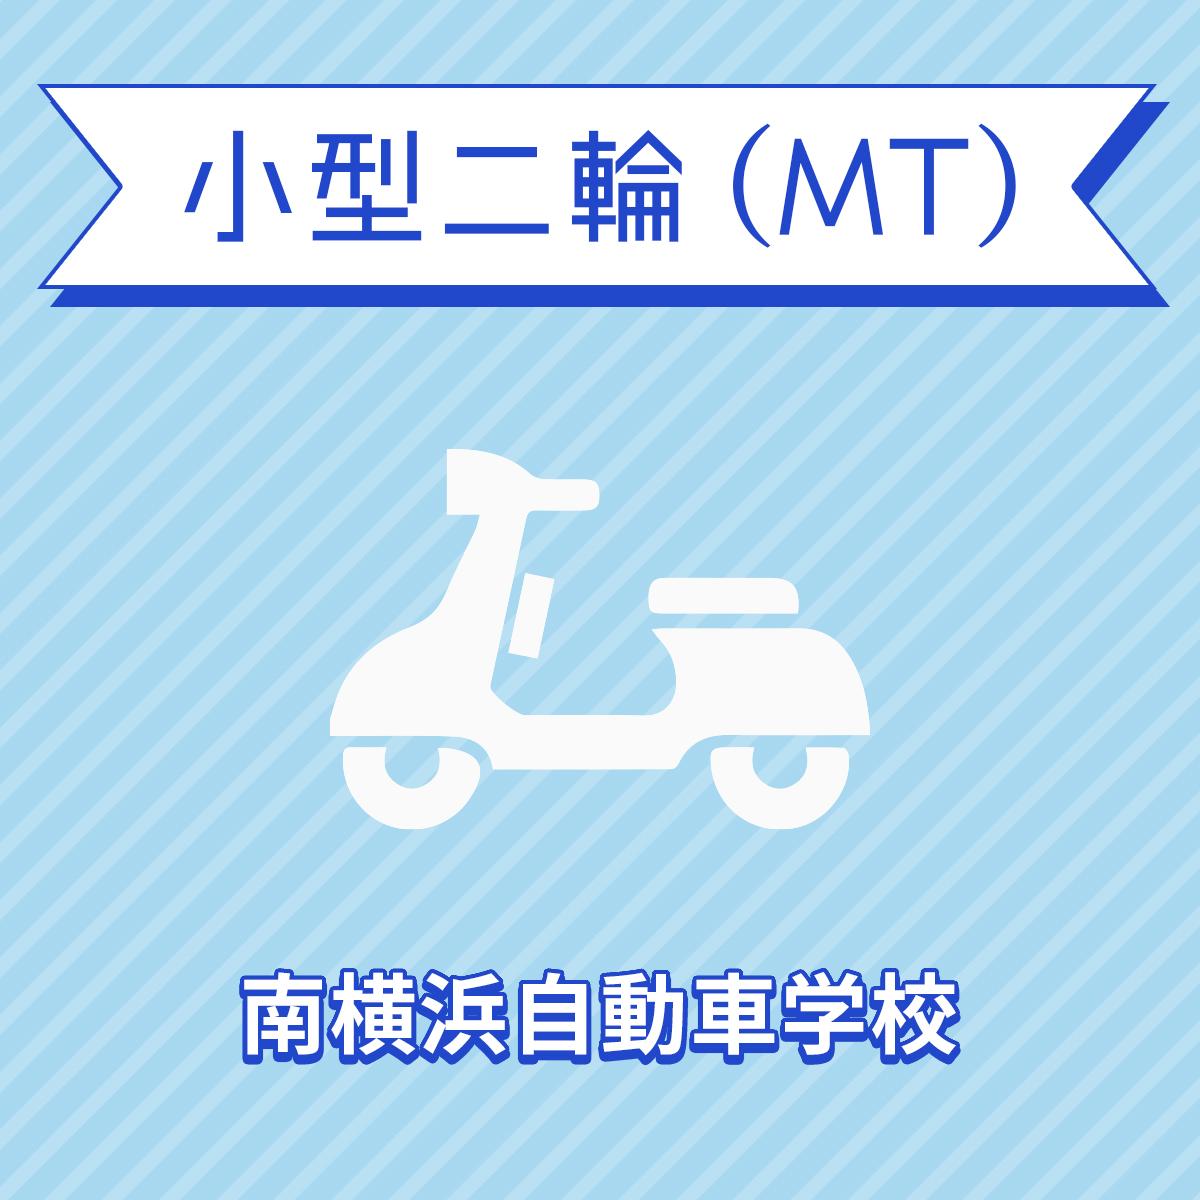 【神奈川県横浜市】小型二輪MTコース(通常料金)<免許なし/原付免許所持対象>